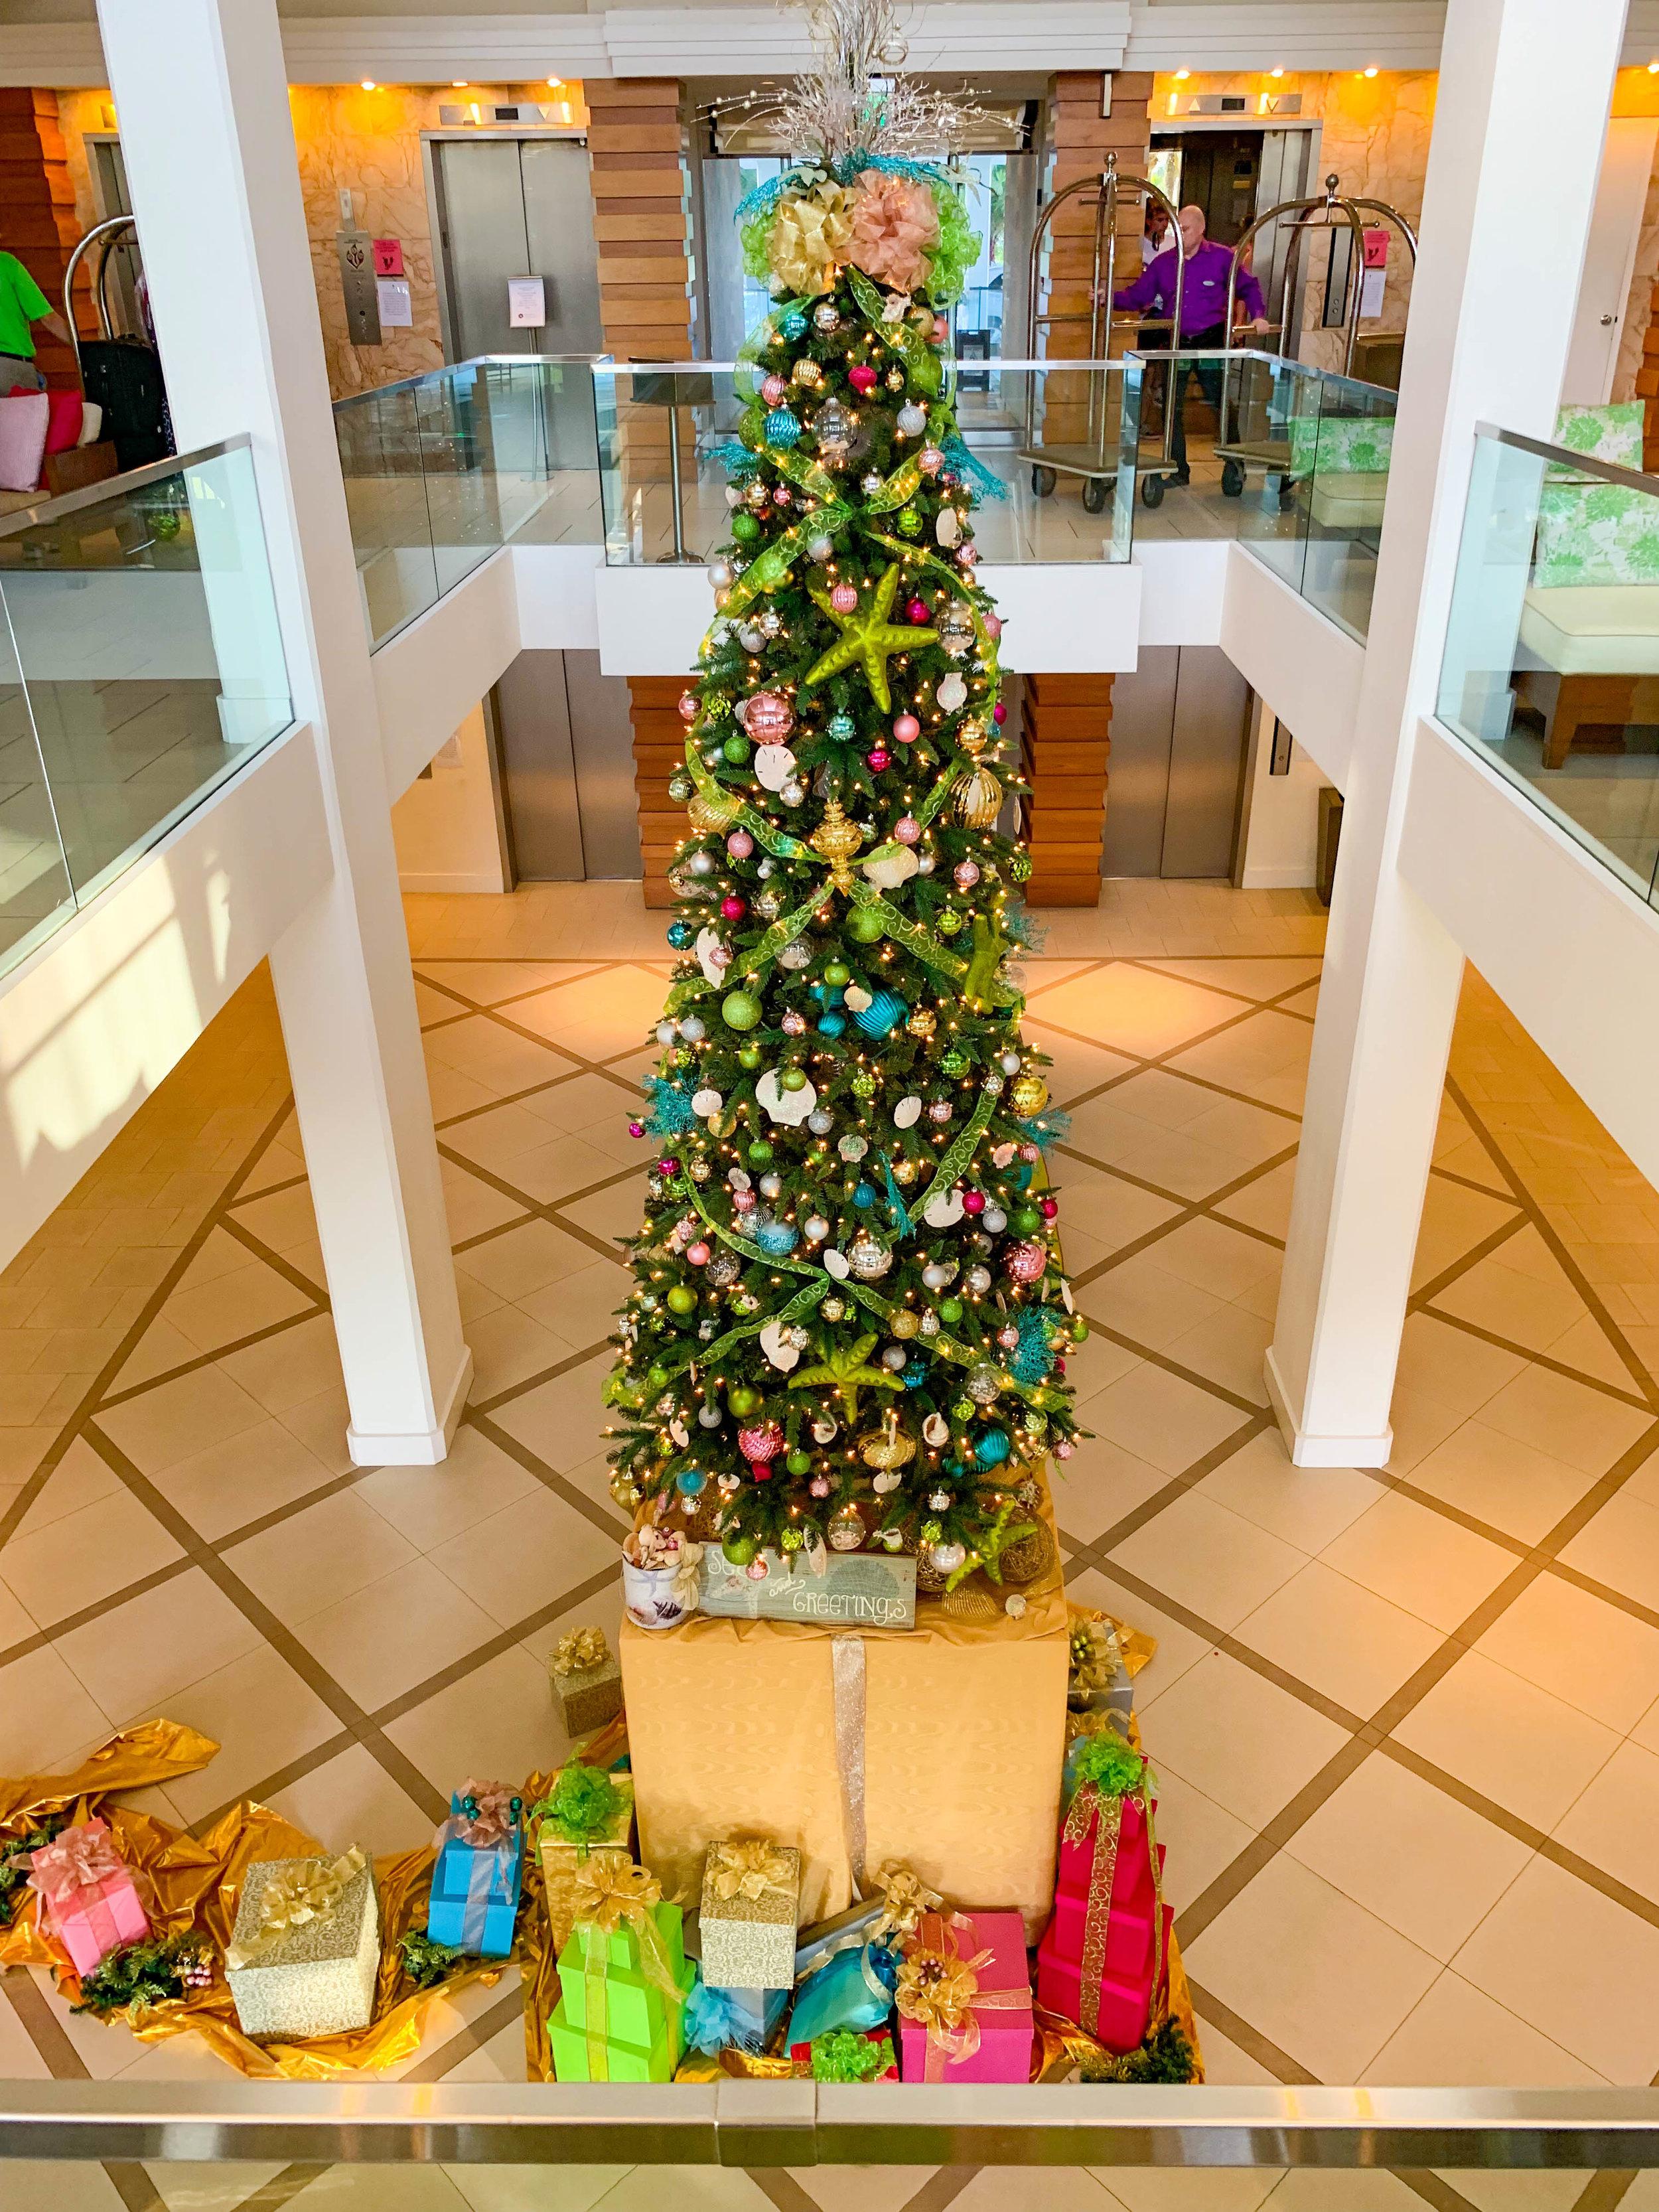 Hyatt Regency Sarasota Lobby Christmas